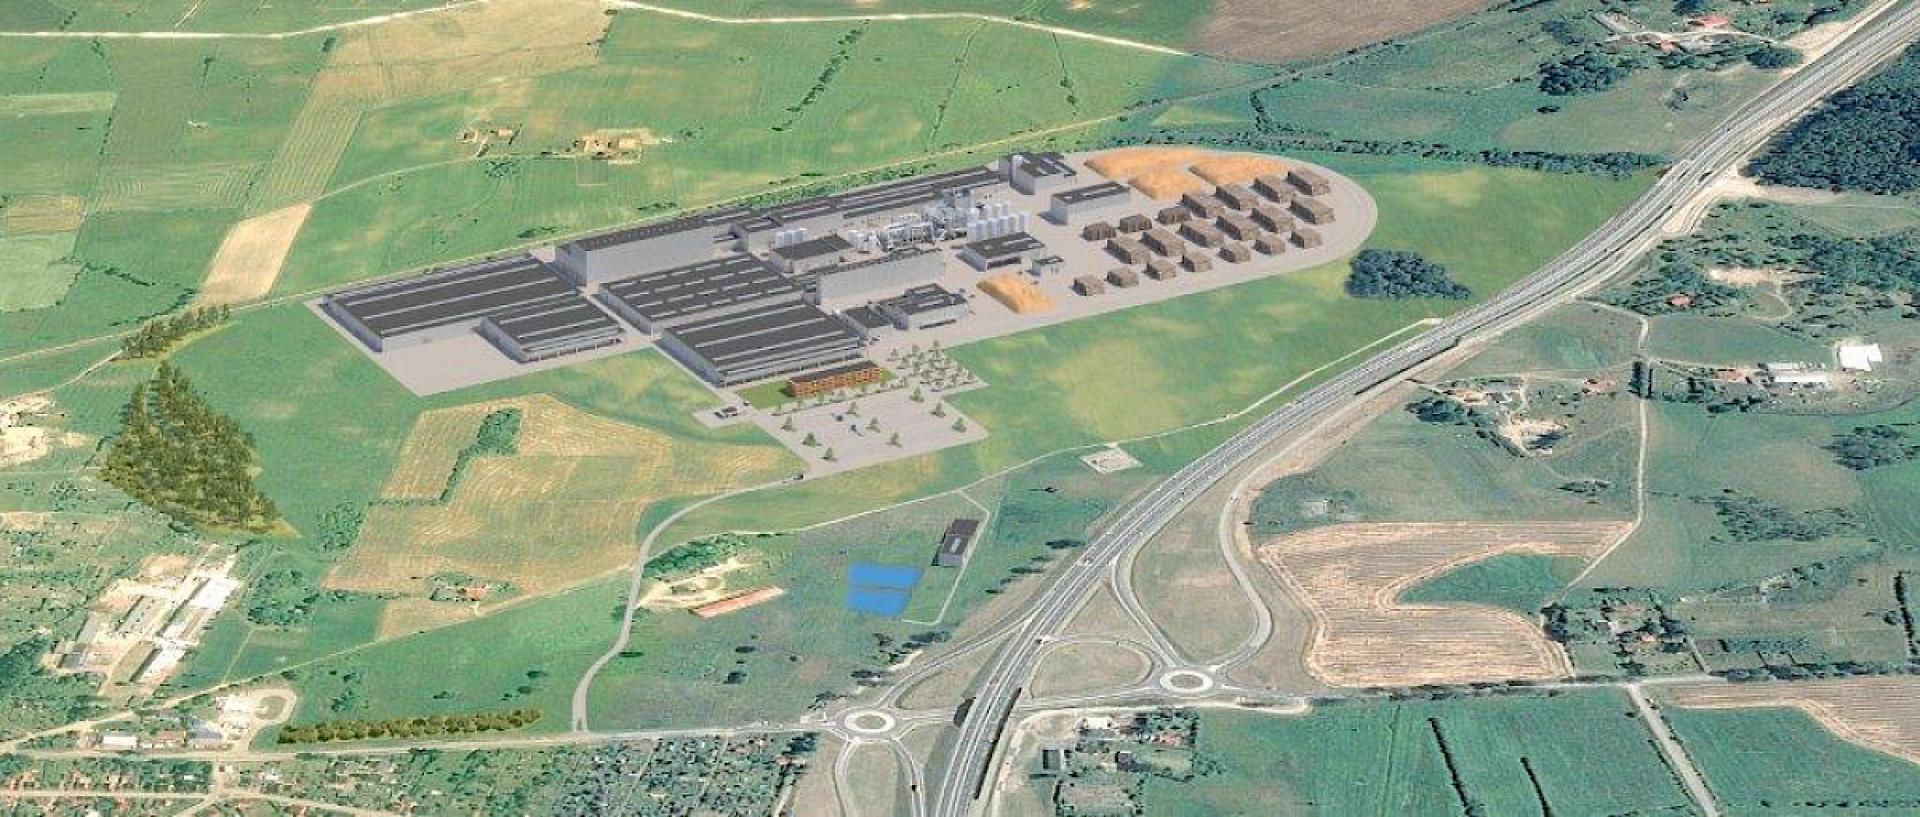 Firma Egger buduje fabrykę w Biskupcu. Fot. Egger